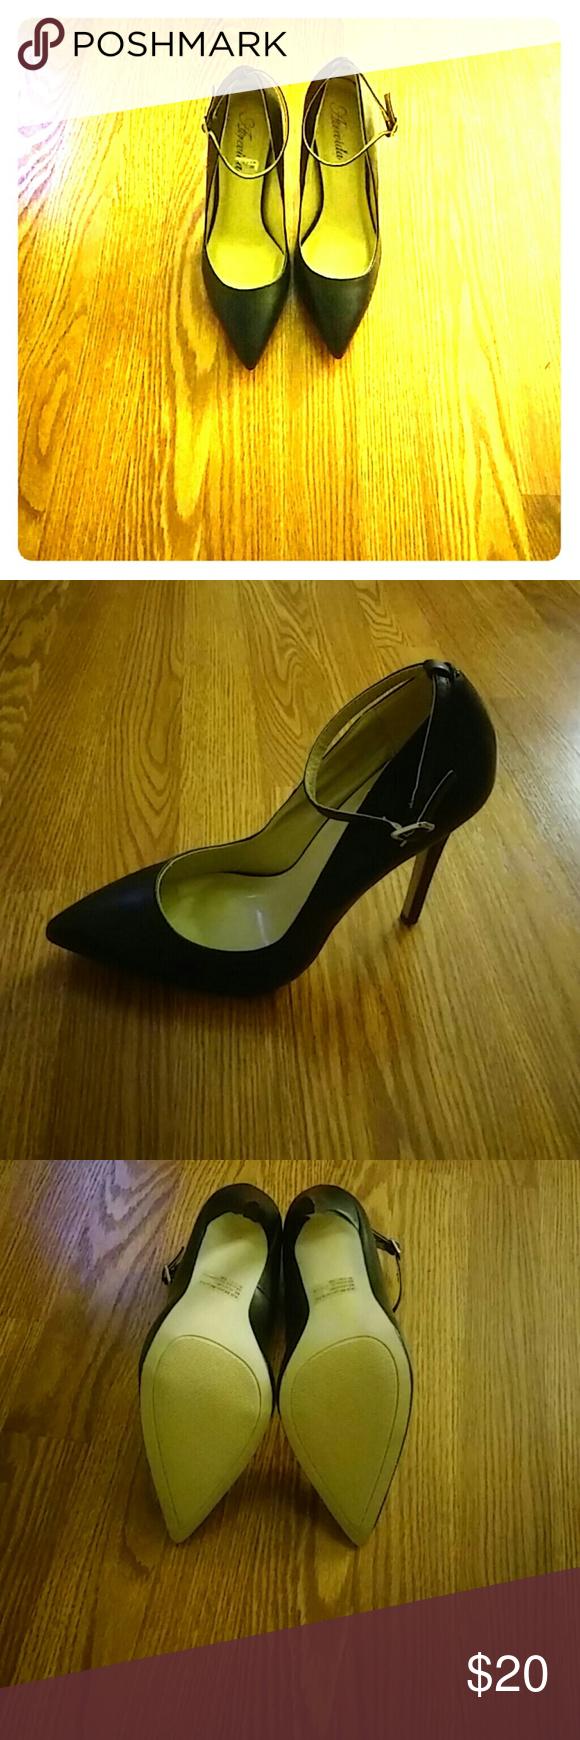 Cute ankle strap black heels Black ankle strap heels New worn just to try on 5 inch heel atrevida Shoes Heels